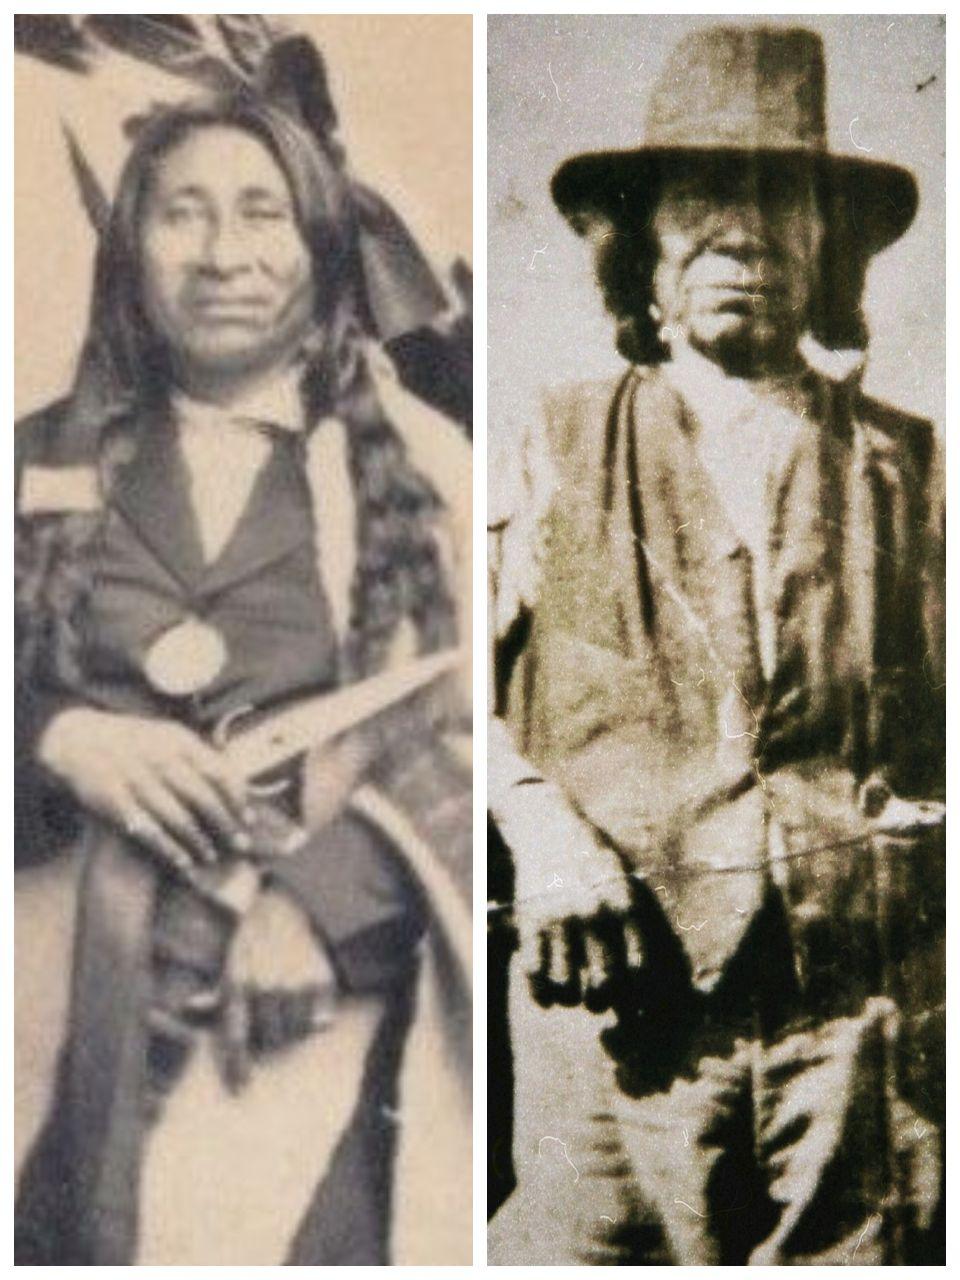 http://www.american-tribes.com/messageboards/dietmar/littlecrowcomparison.jpg